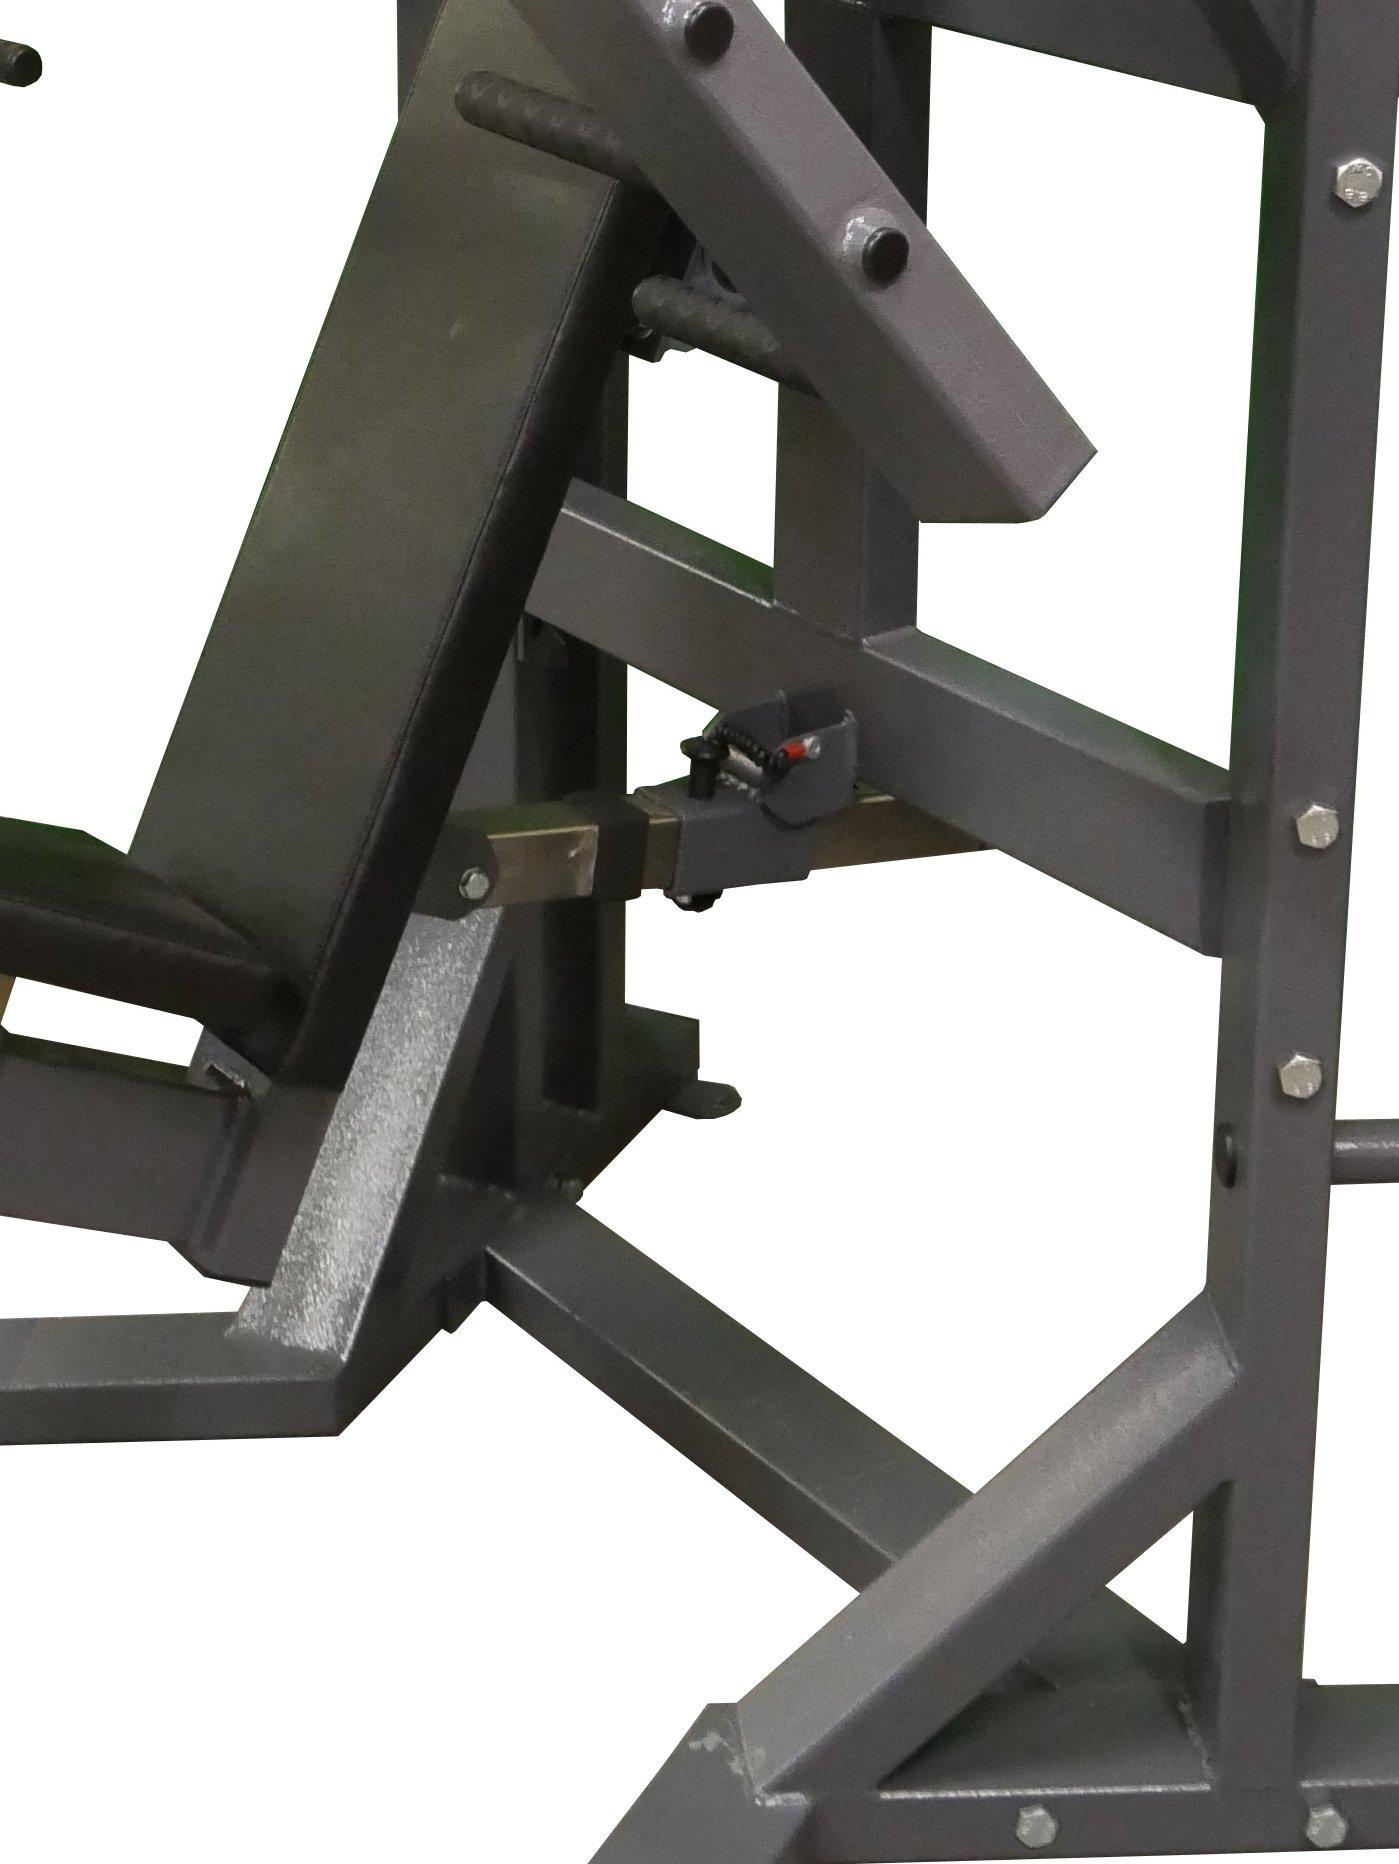 Seated-Chest-Shoulder-Press-Machine-Adjustable-Seat-A6XX2P